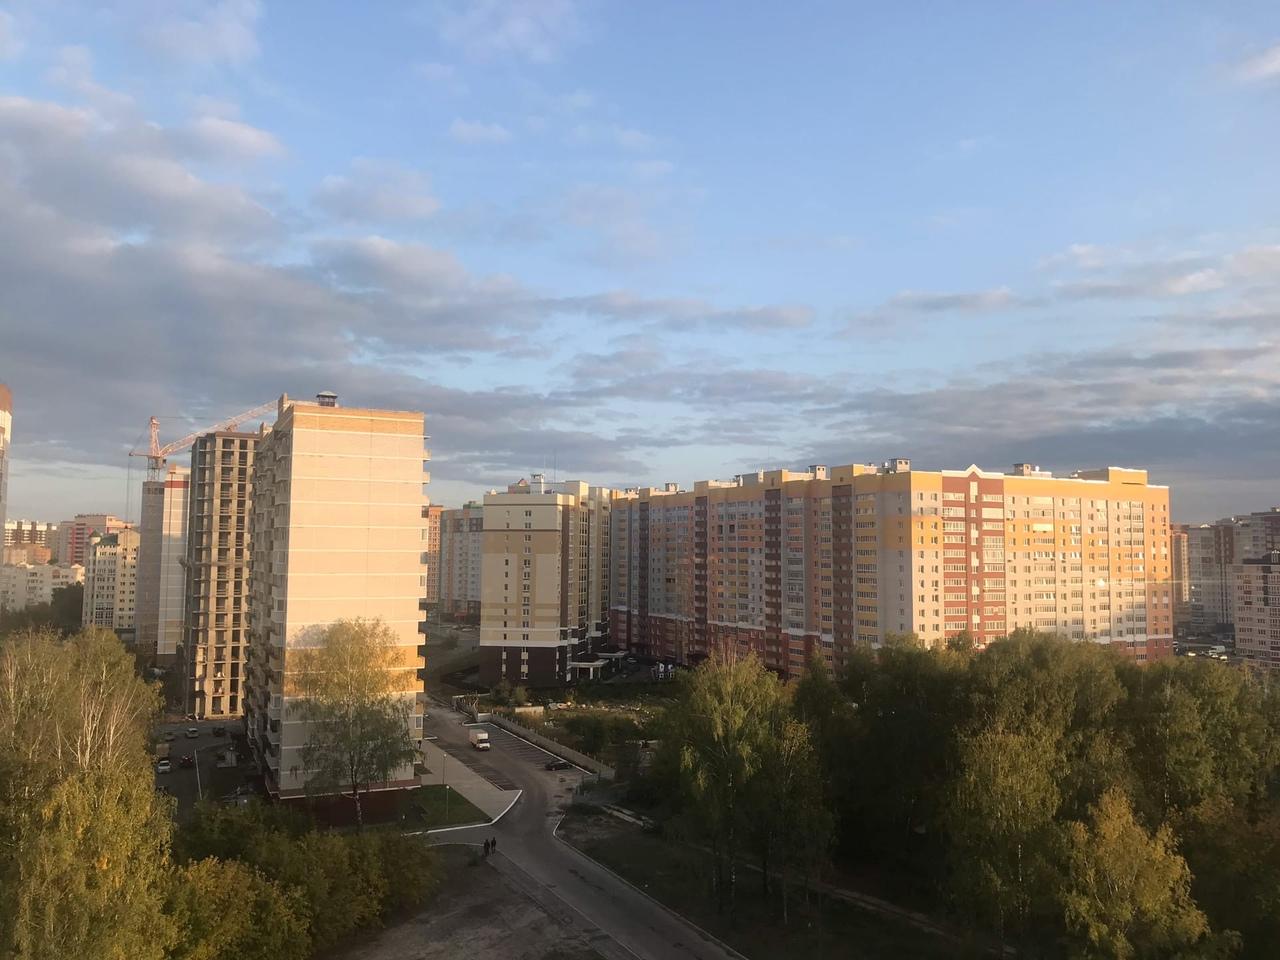 В Брянской области 10 октября прогнозируют туман и 6 градусов мороза